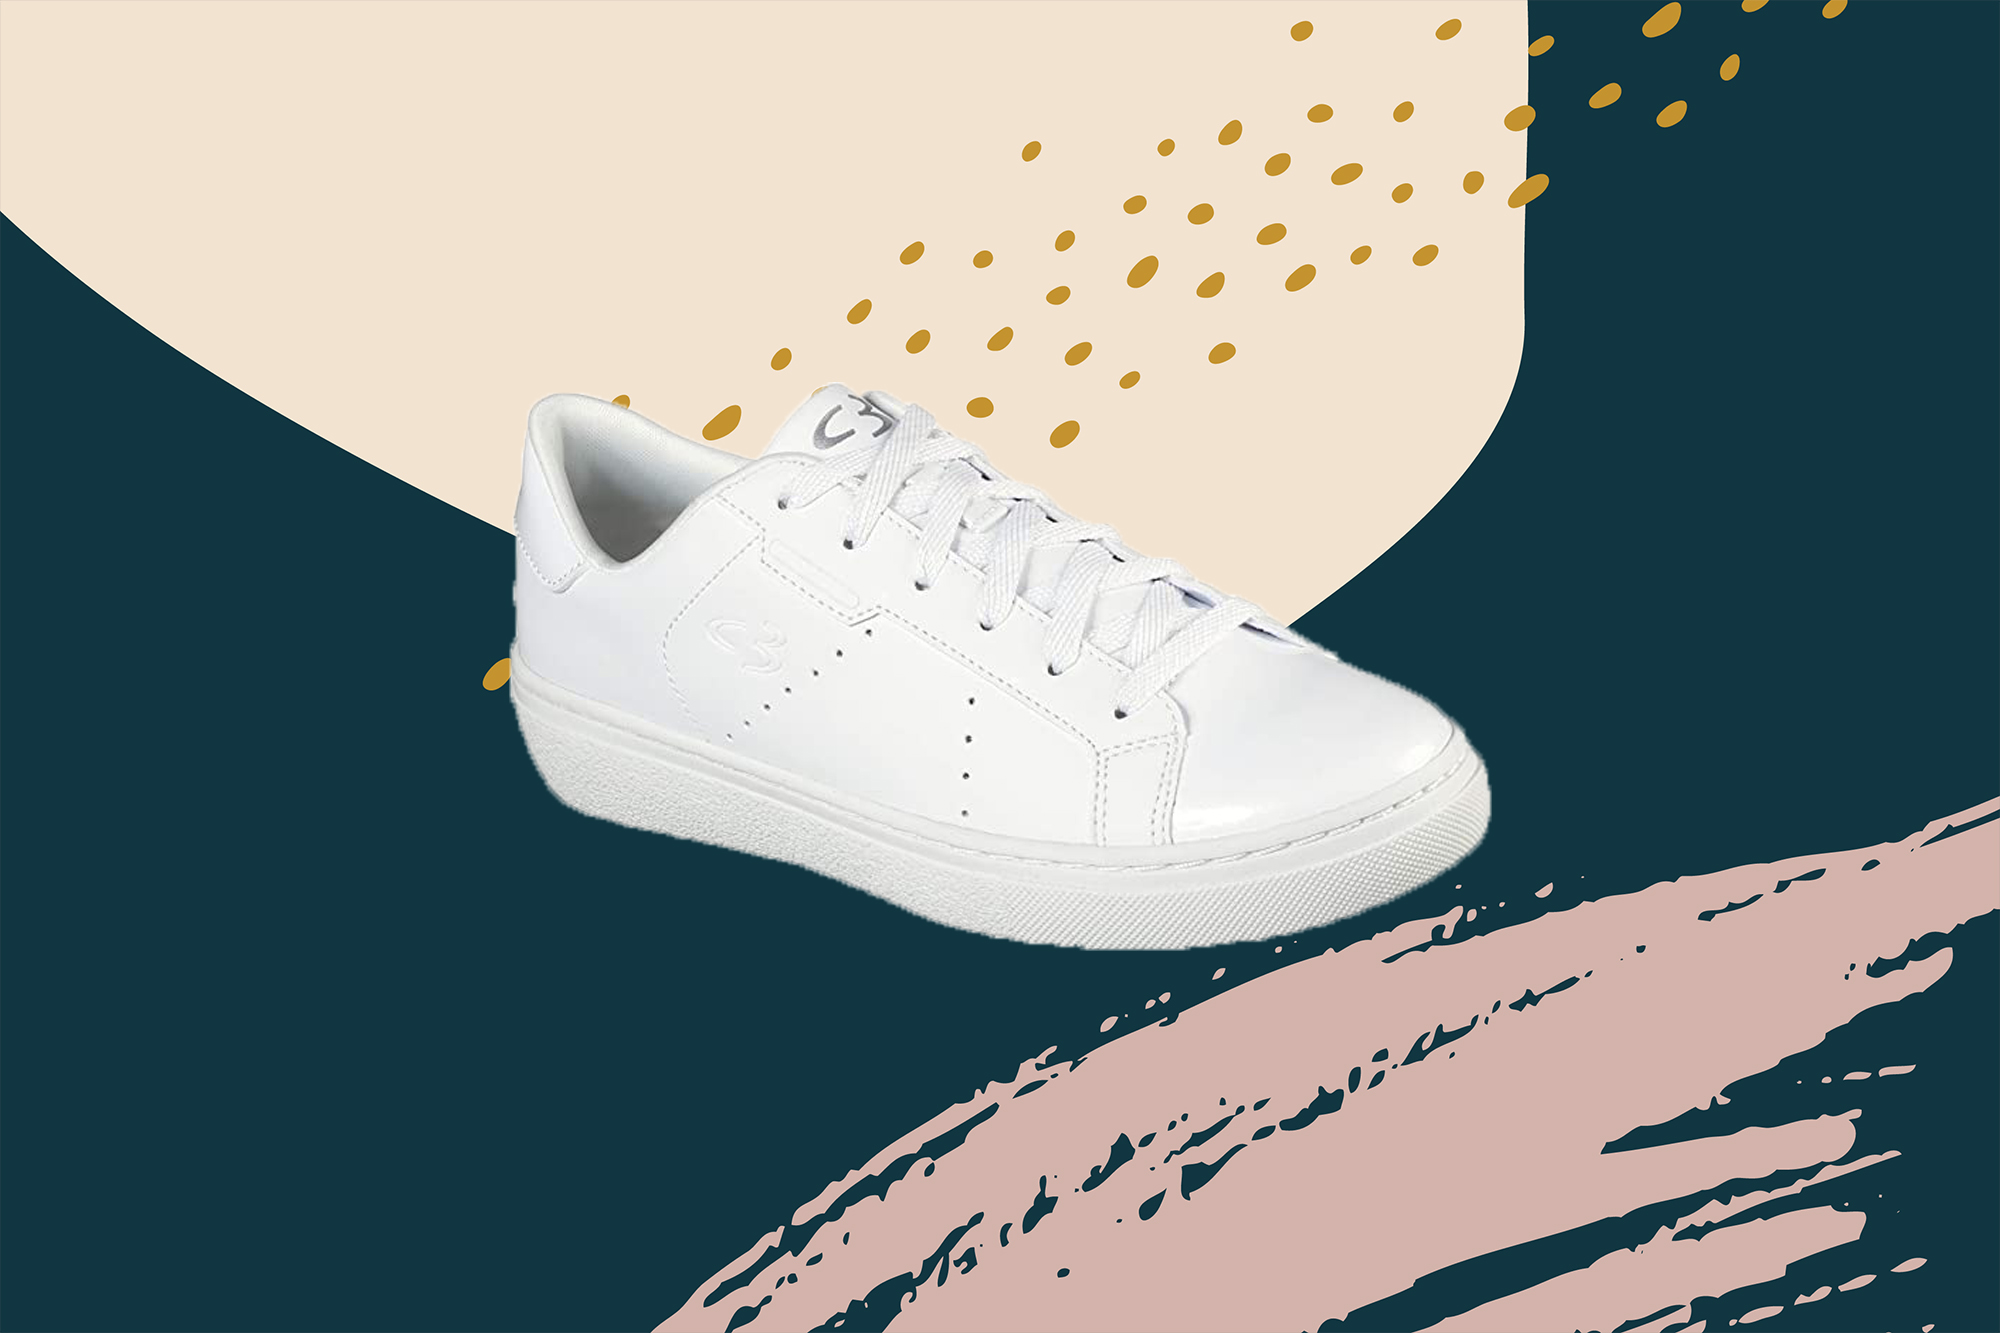 skechers comfy sneakers